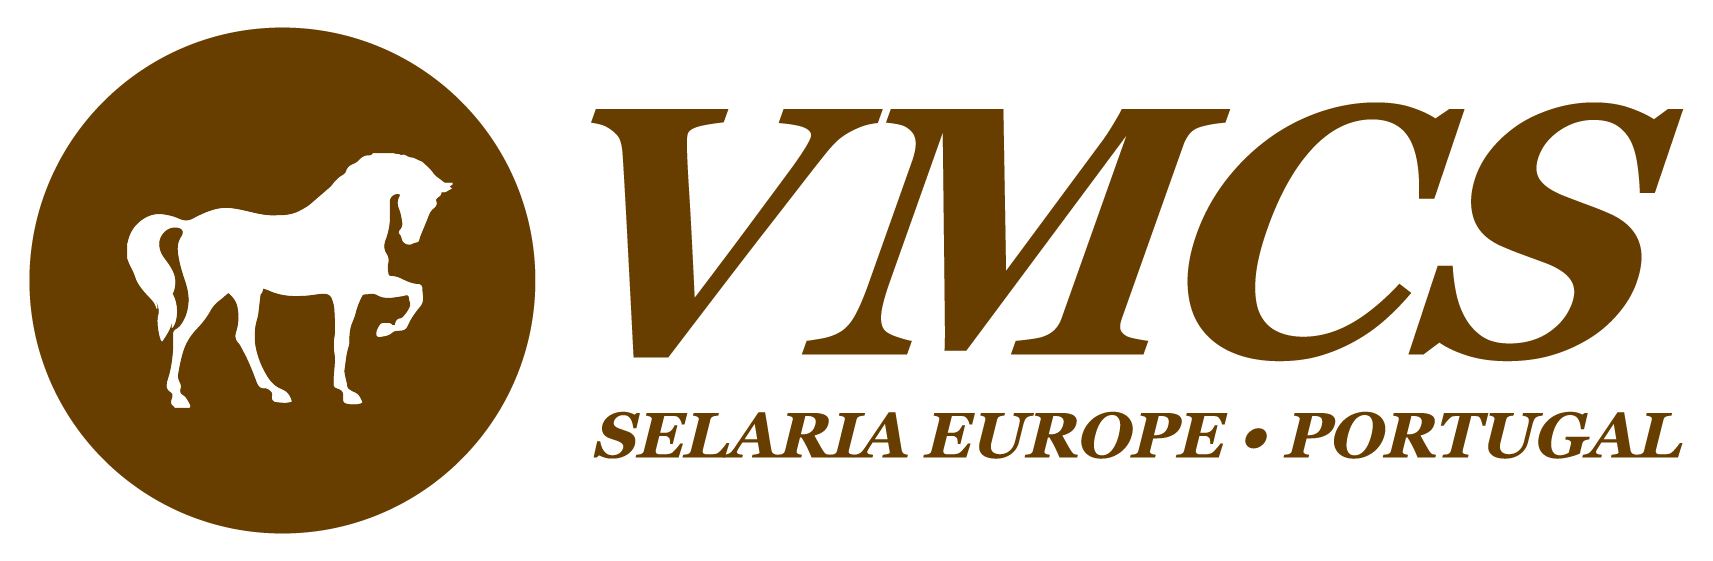 VMCS - SELARIA EUROPE